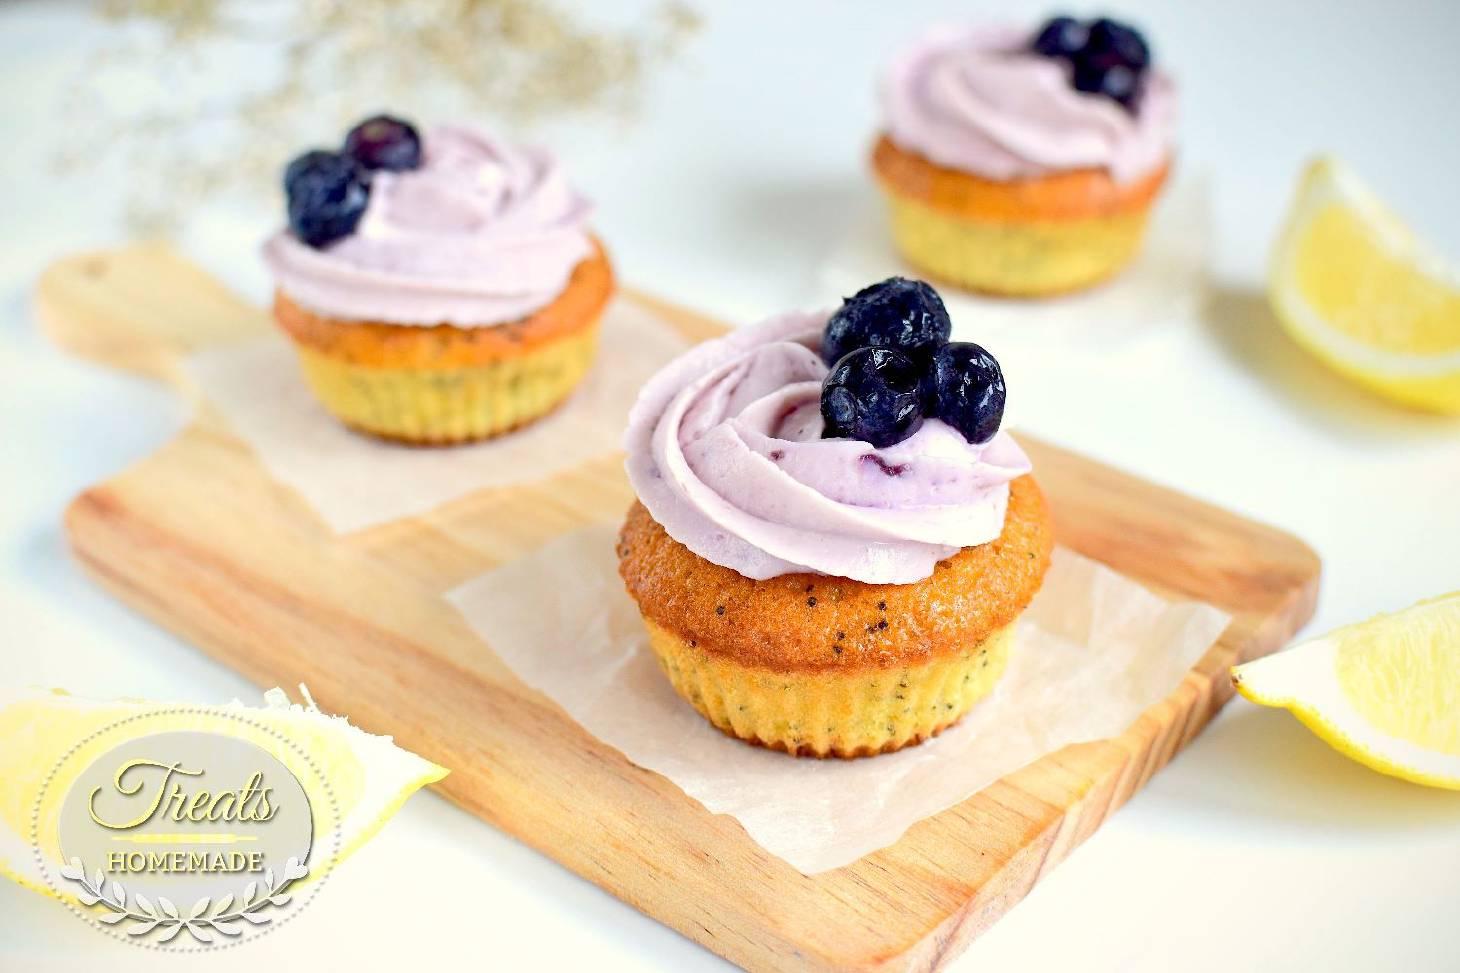 Lemon and Blueberry Cupcake